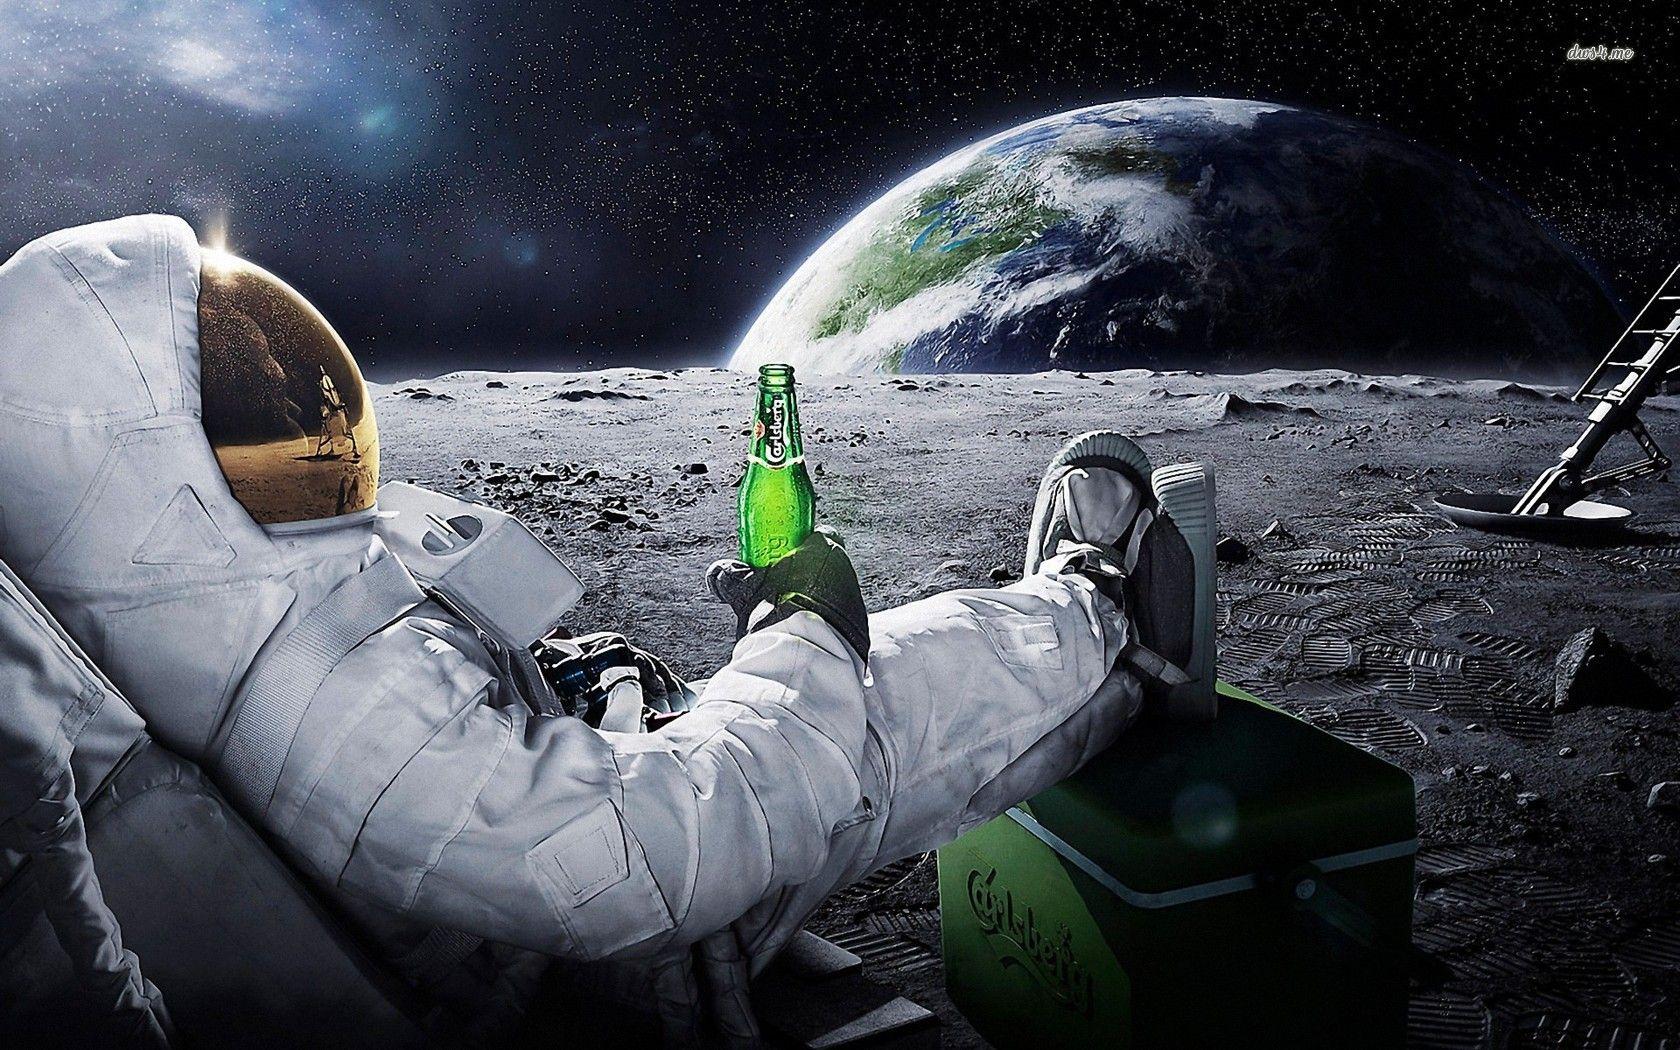 Astronaut Enjoying A Carlsberg On The Moon Hd Wallpaper Astronaut Wallpaper Astronauts In Space Desktop Wallpaper